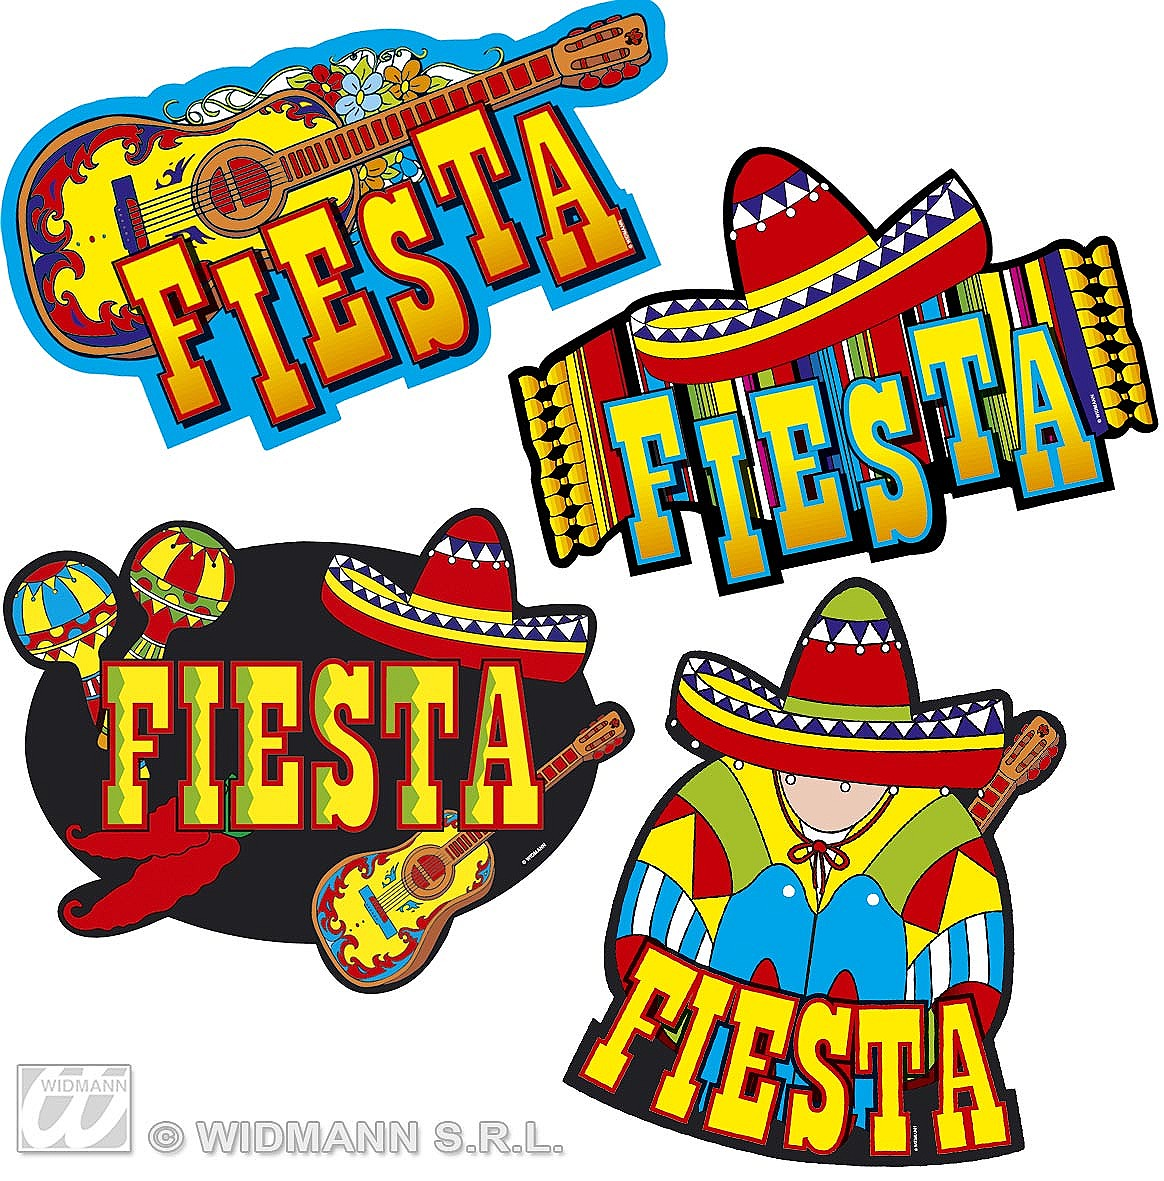 Decoration clipart mexican decoration PartyWorld Party Decorations Mexican Party